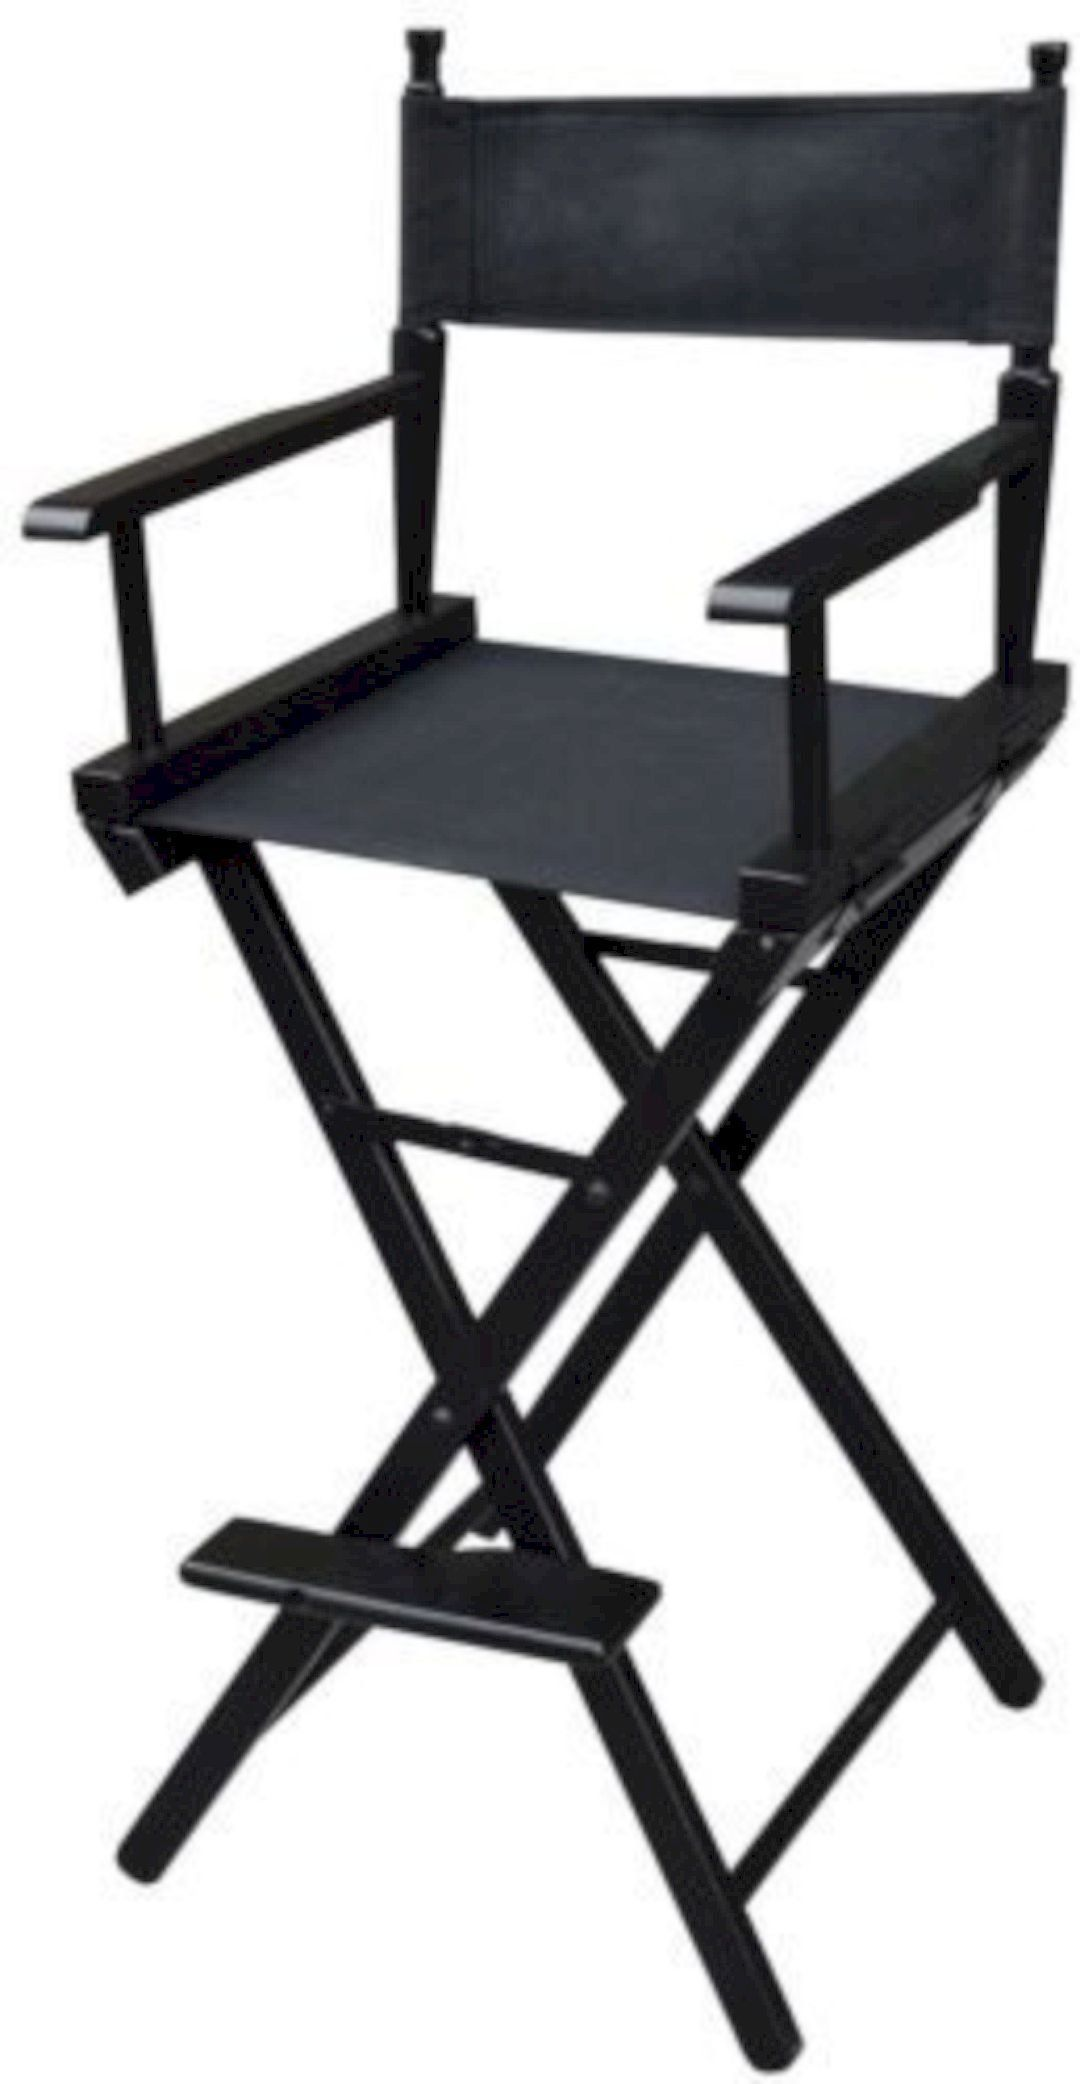 Kuschall Superstar Wheelchair The World S Lightest Wheelchair Makeup Chair Makeup Artist Chair Makeup Studio